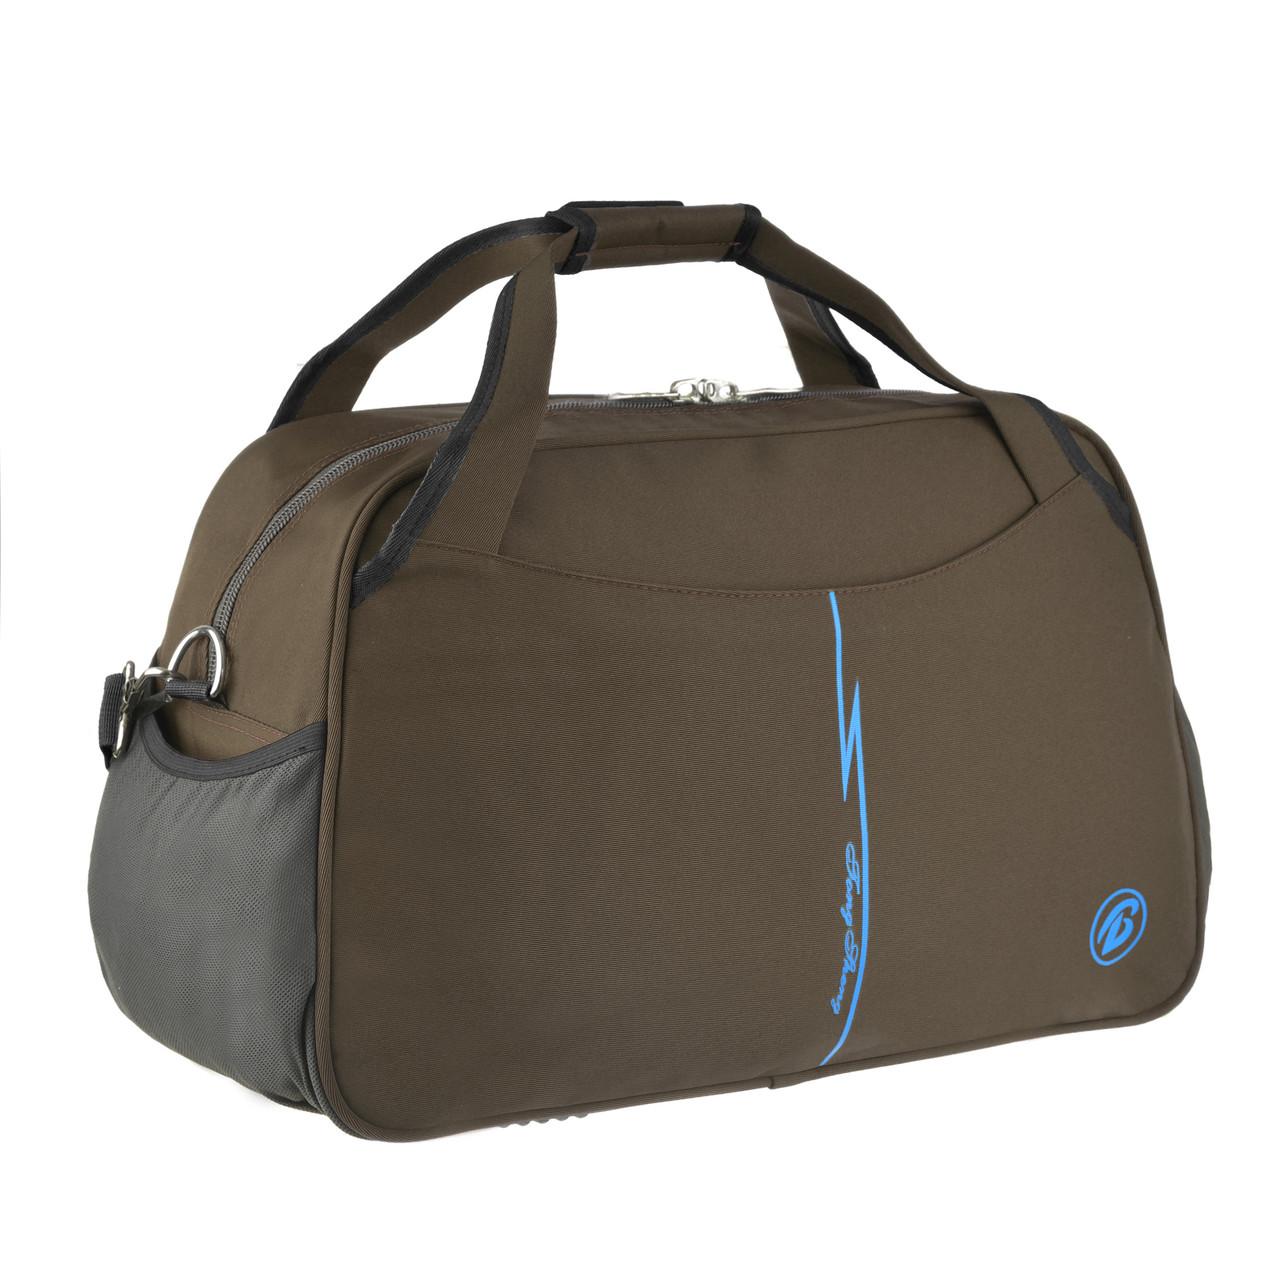 Дорожная сумка Tong Scheng  52х33х26 ткань нейлон коричневая   кс99210кор